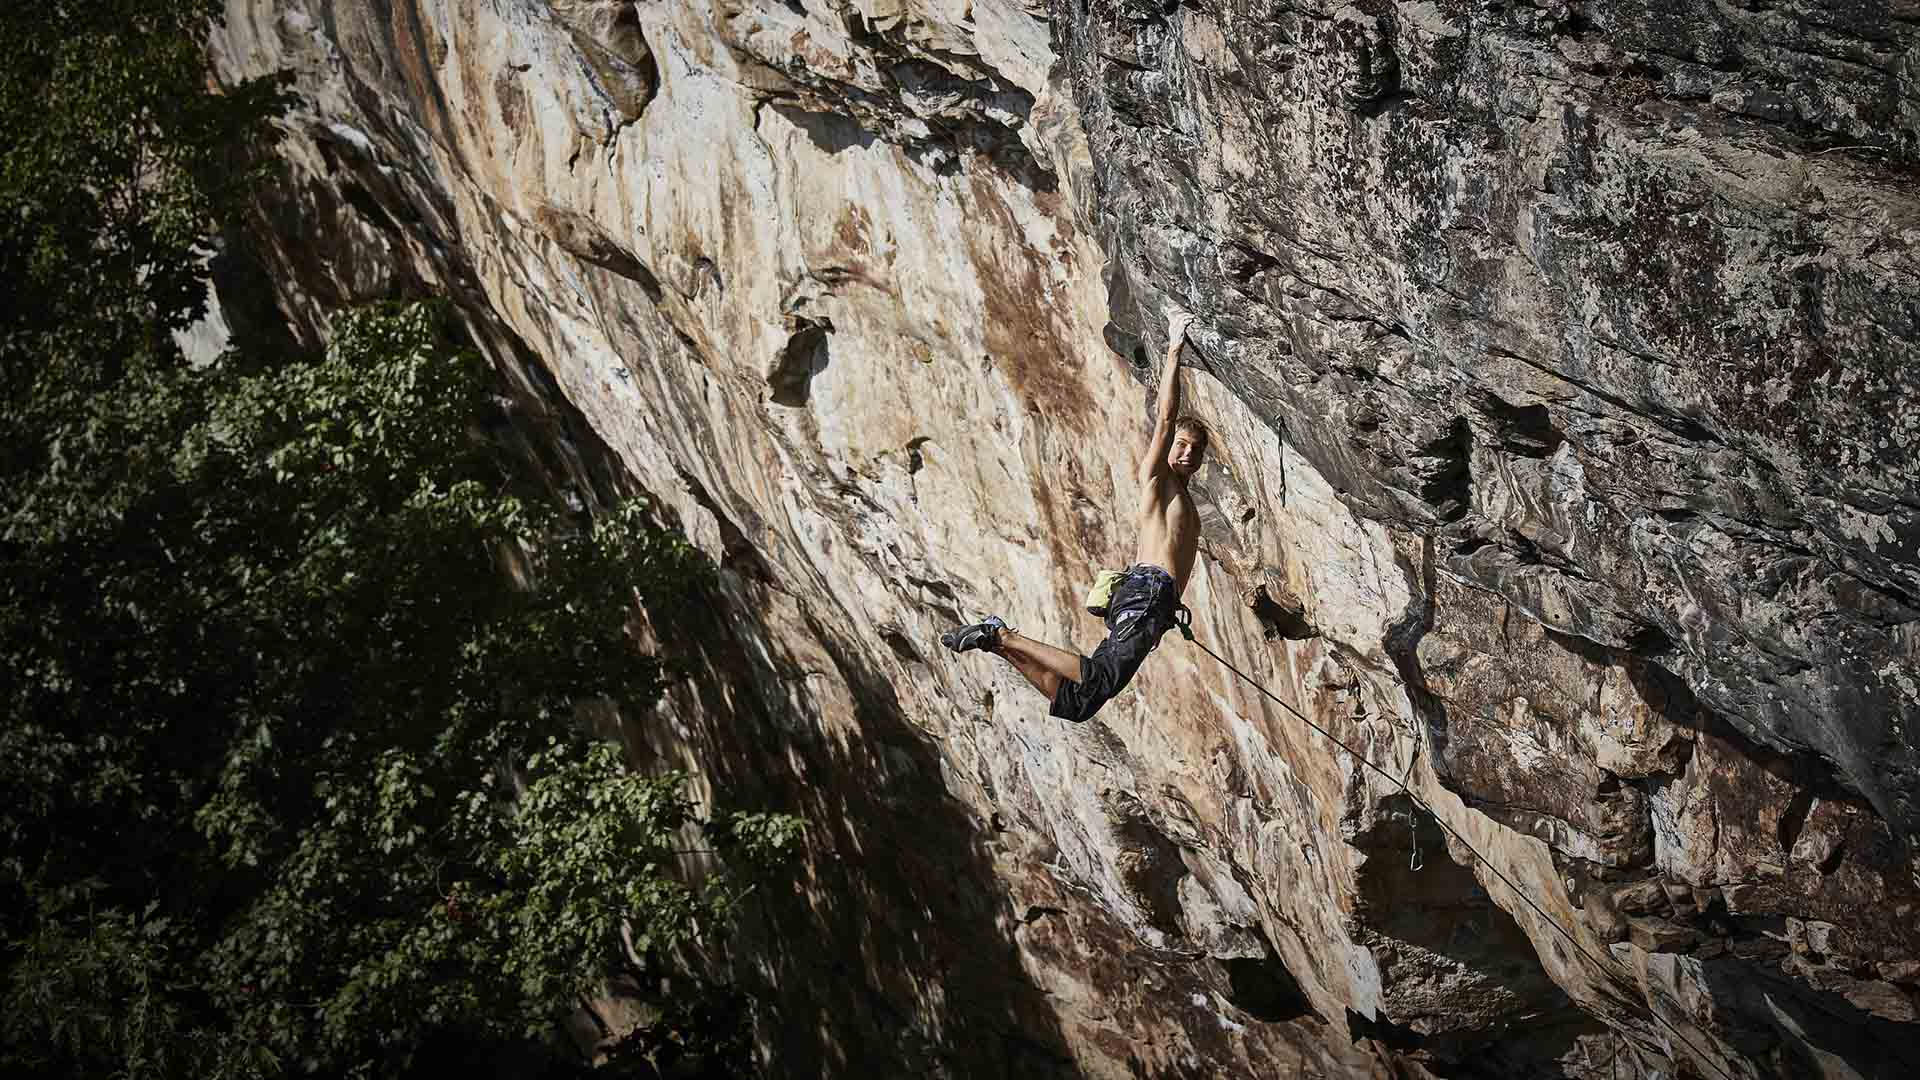 Kletterausrüstung Globetrotter : Climbing basics was man als anfänger beim boulder